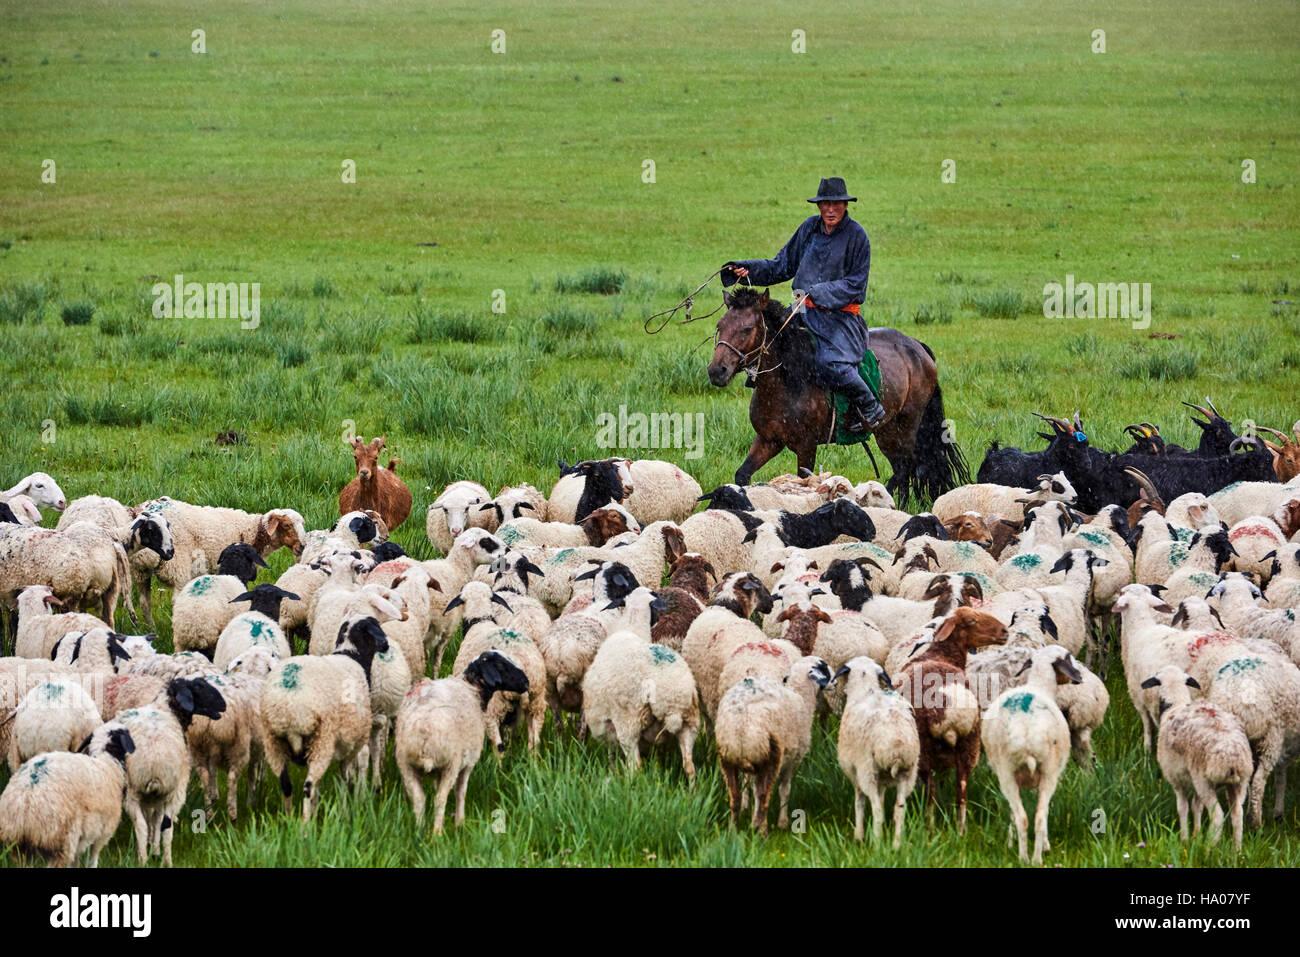 Mongolia, provincia Arkhangai, campamento nómada, rebaño de ovejas bajo la lluvia Imagen De Stock